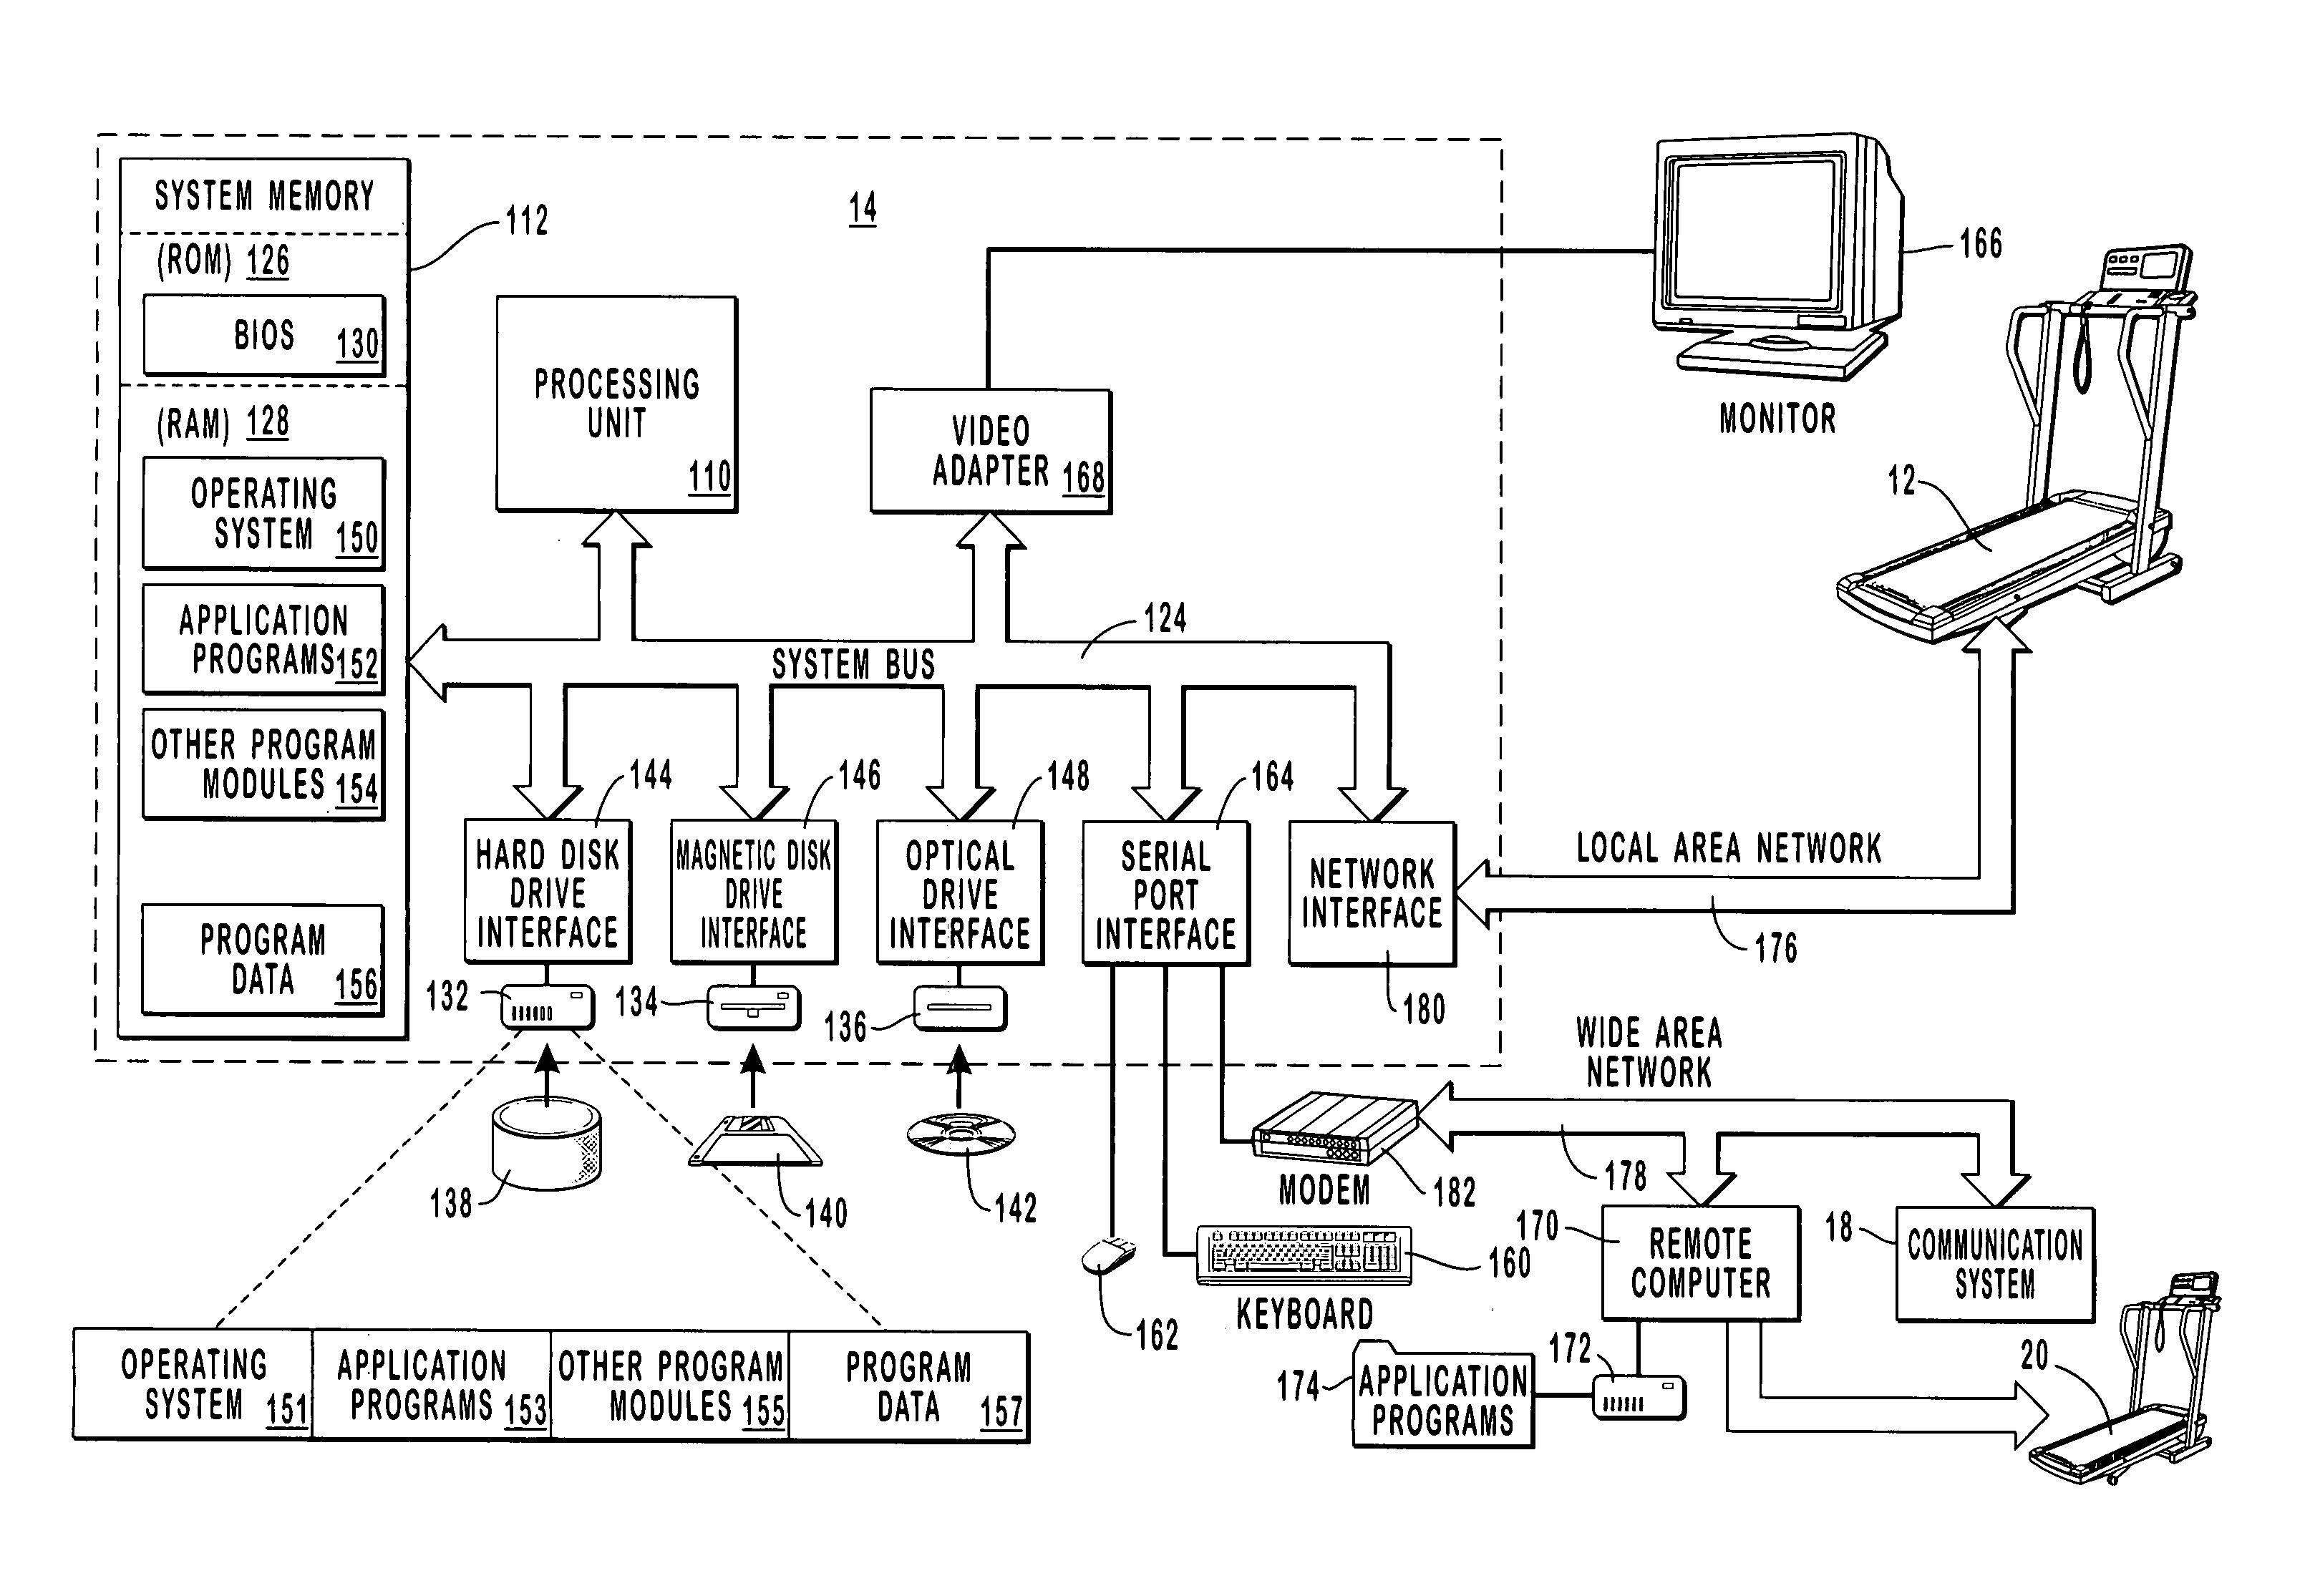 Diagram Yamaha 350 Irs Kodak Wiring Diagram Full Version Hd Quality Wiring Diagram Diagramsfung Noidimontegiorgio It